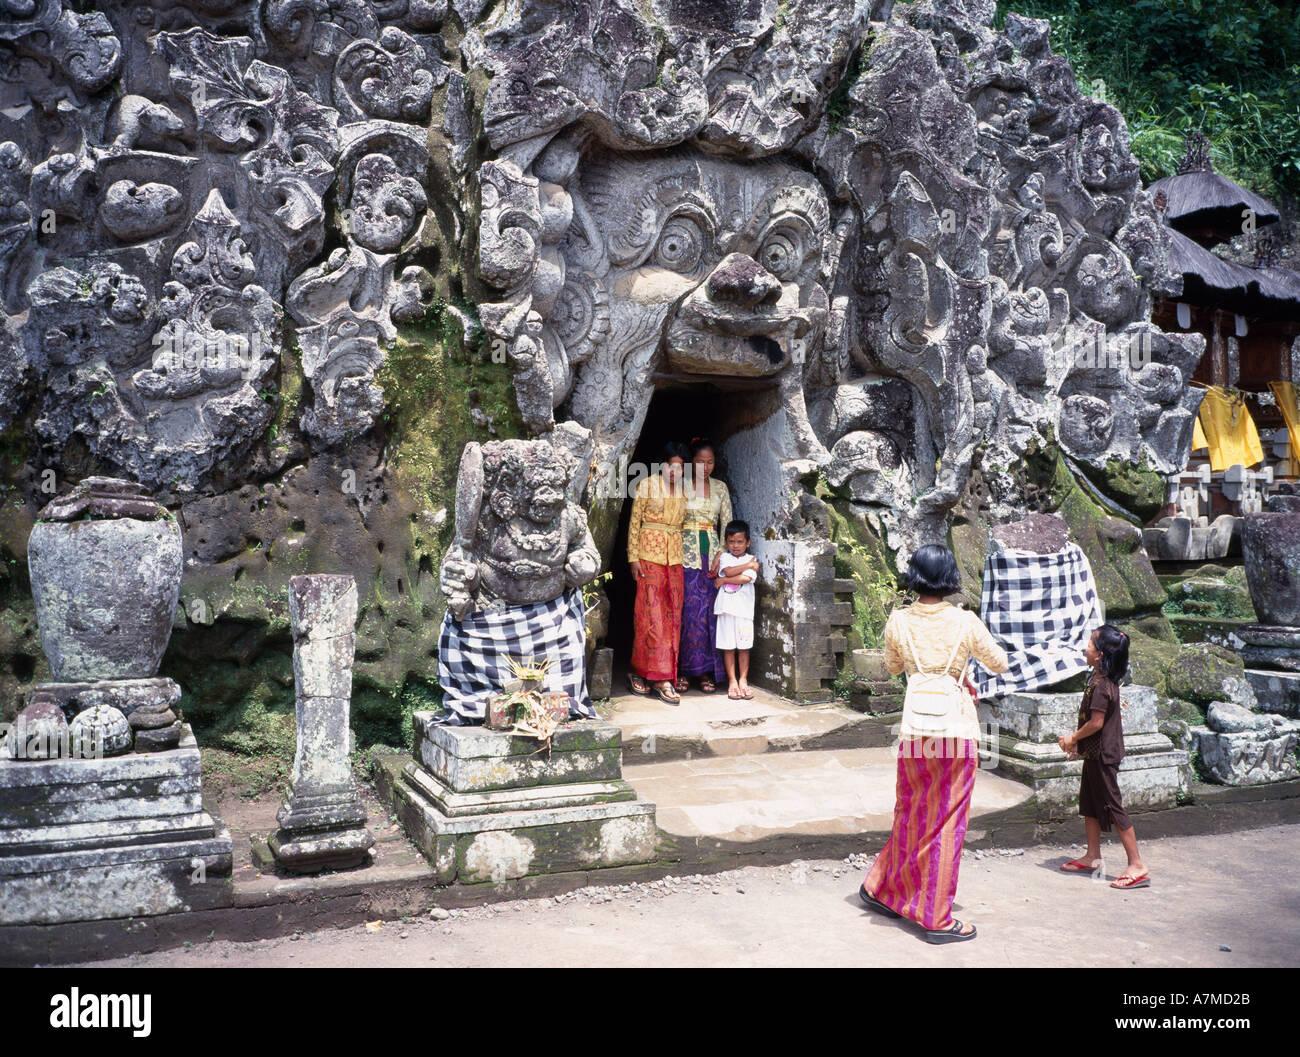 Indonesia Bali Goa Gajah Religion Balinese People In